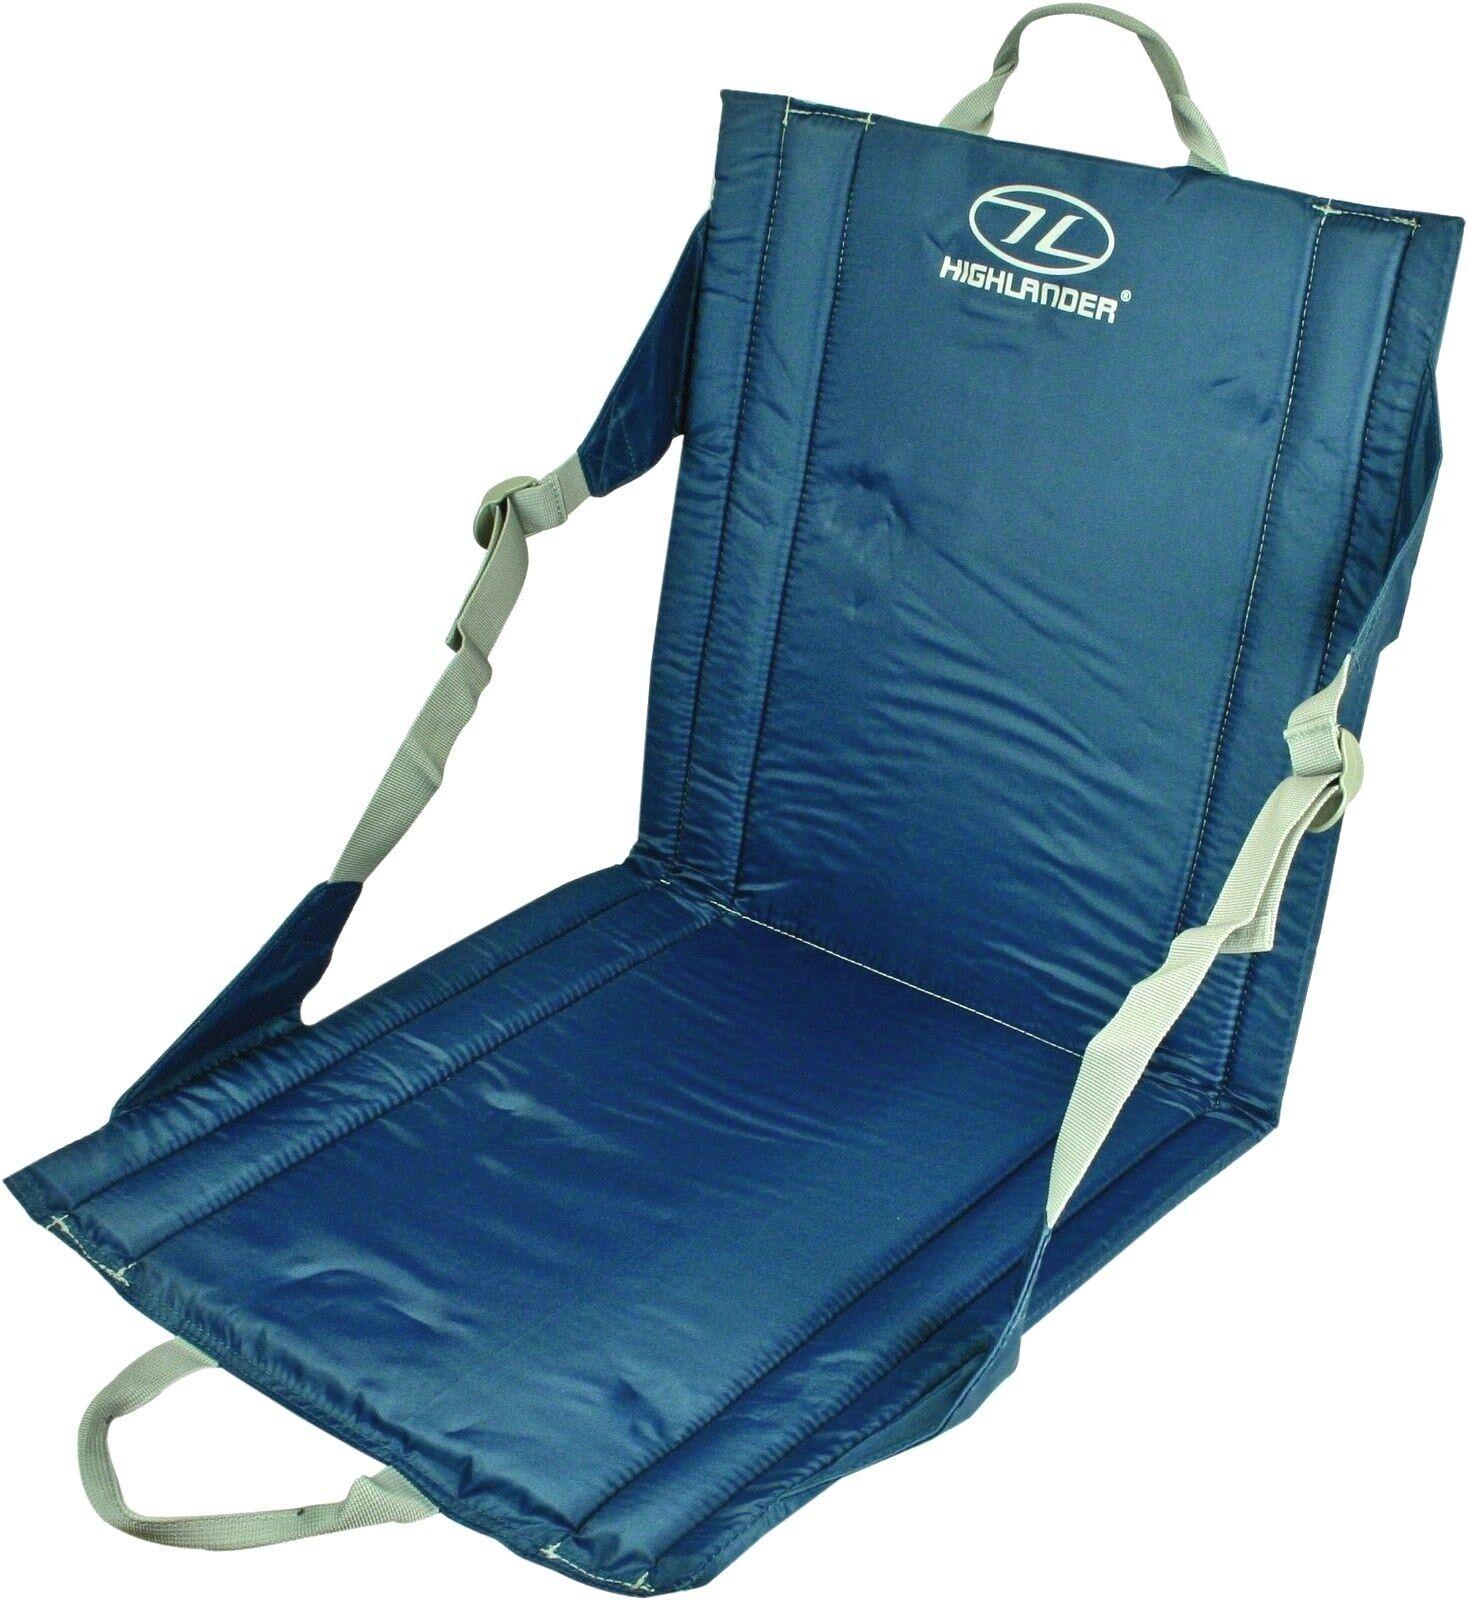 Outdoor Imperméable Imperméable Imperméable Siège Support Arrière Confortable Camping Pêche Picnic Beach Chair e3414a